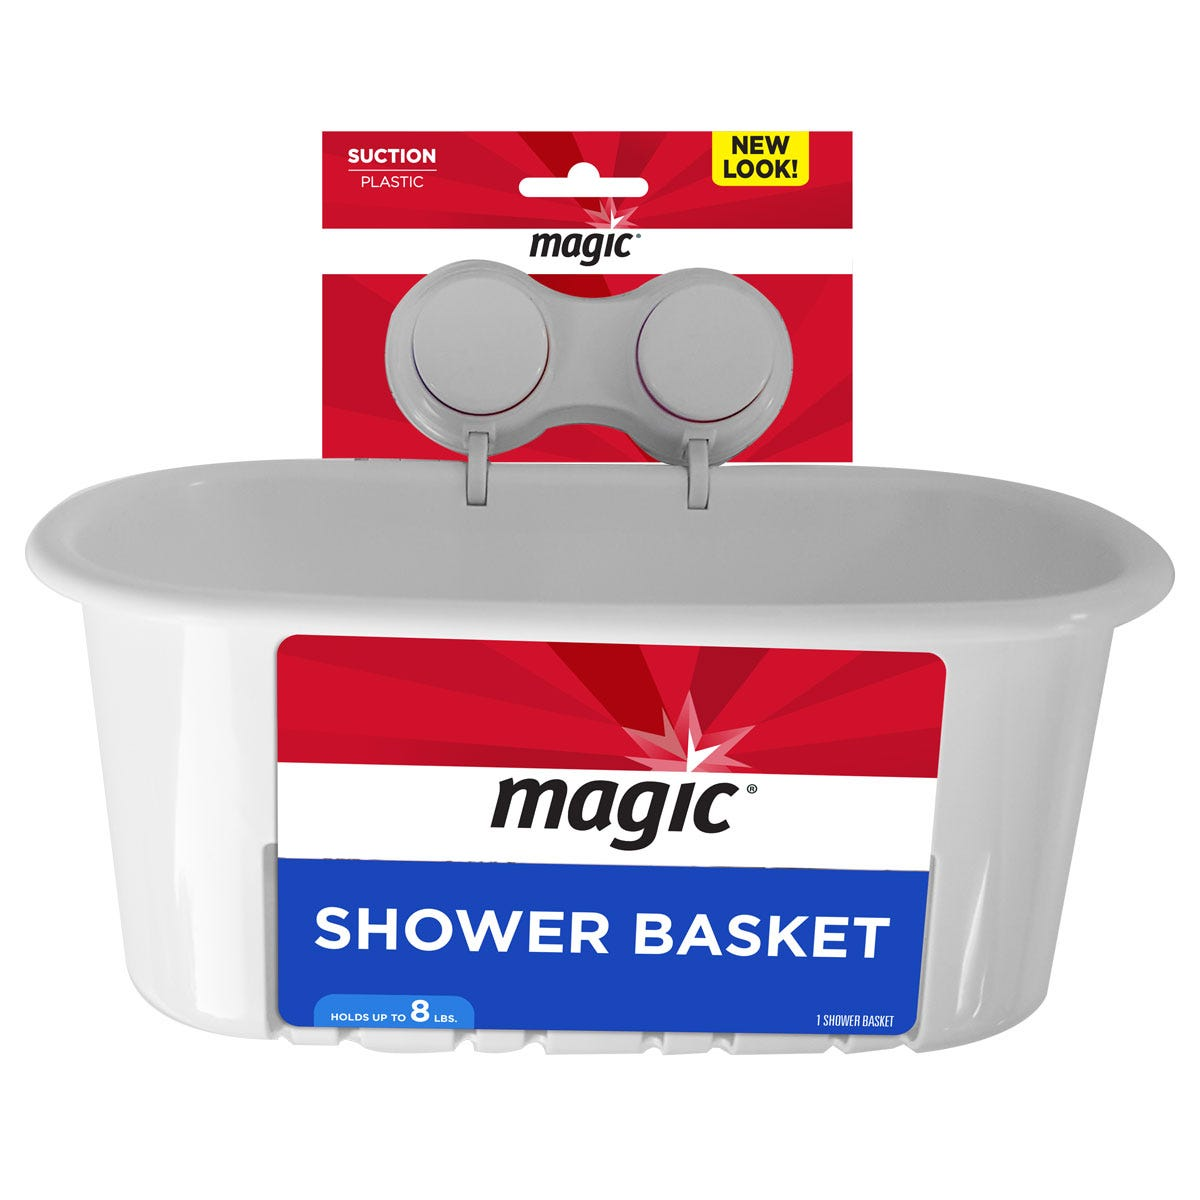 https://googone.com/media/catalog/product/m/a/magic-shower-basket_front.jpg